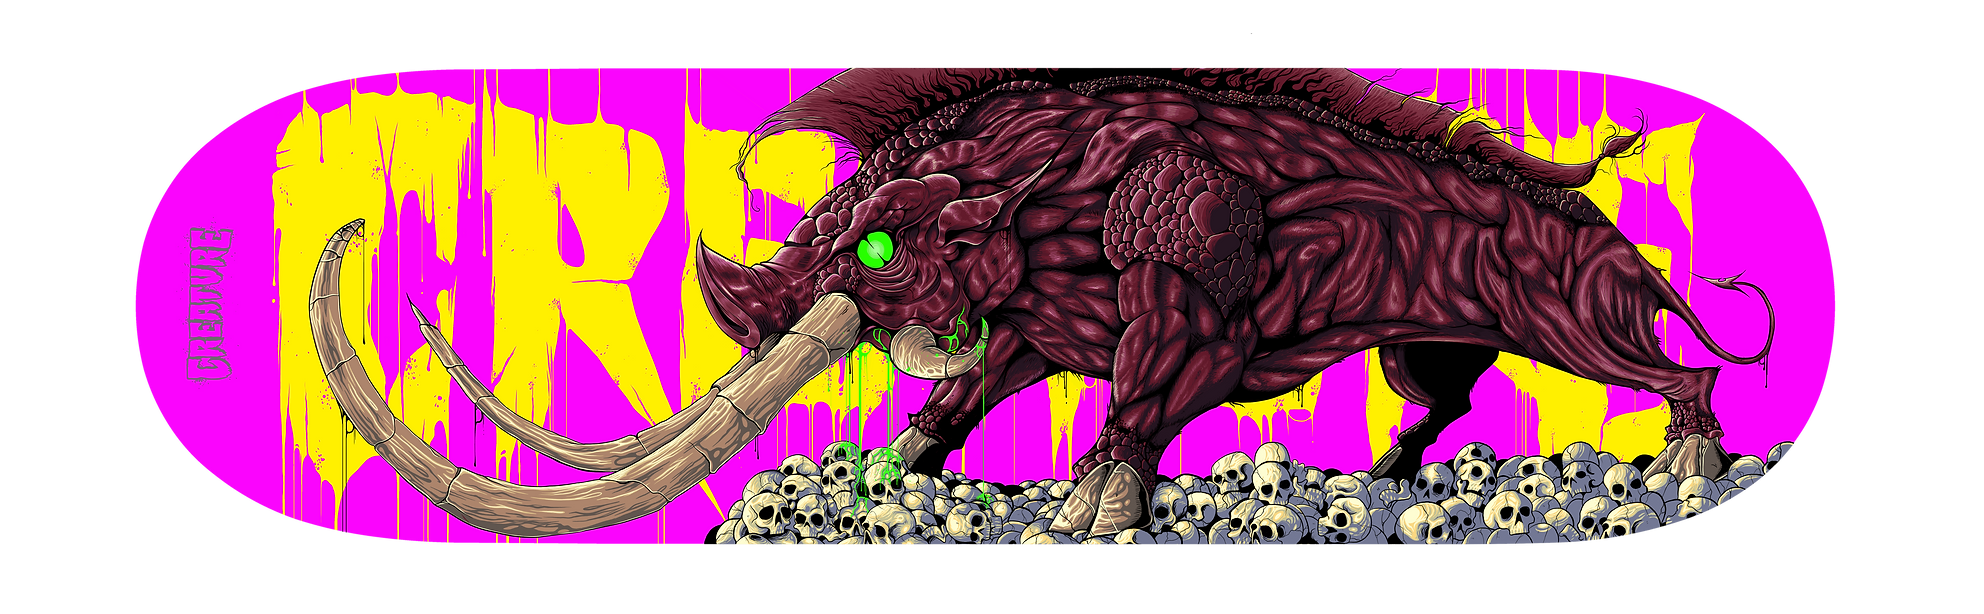 creaturesub2.png